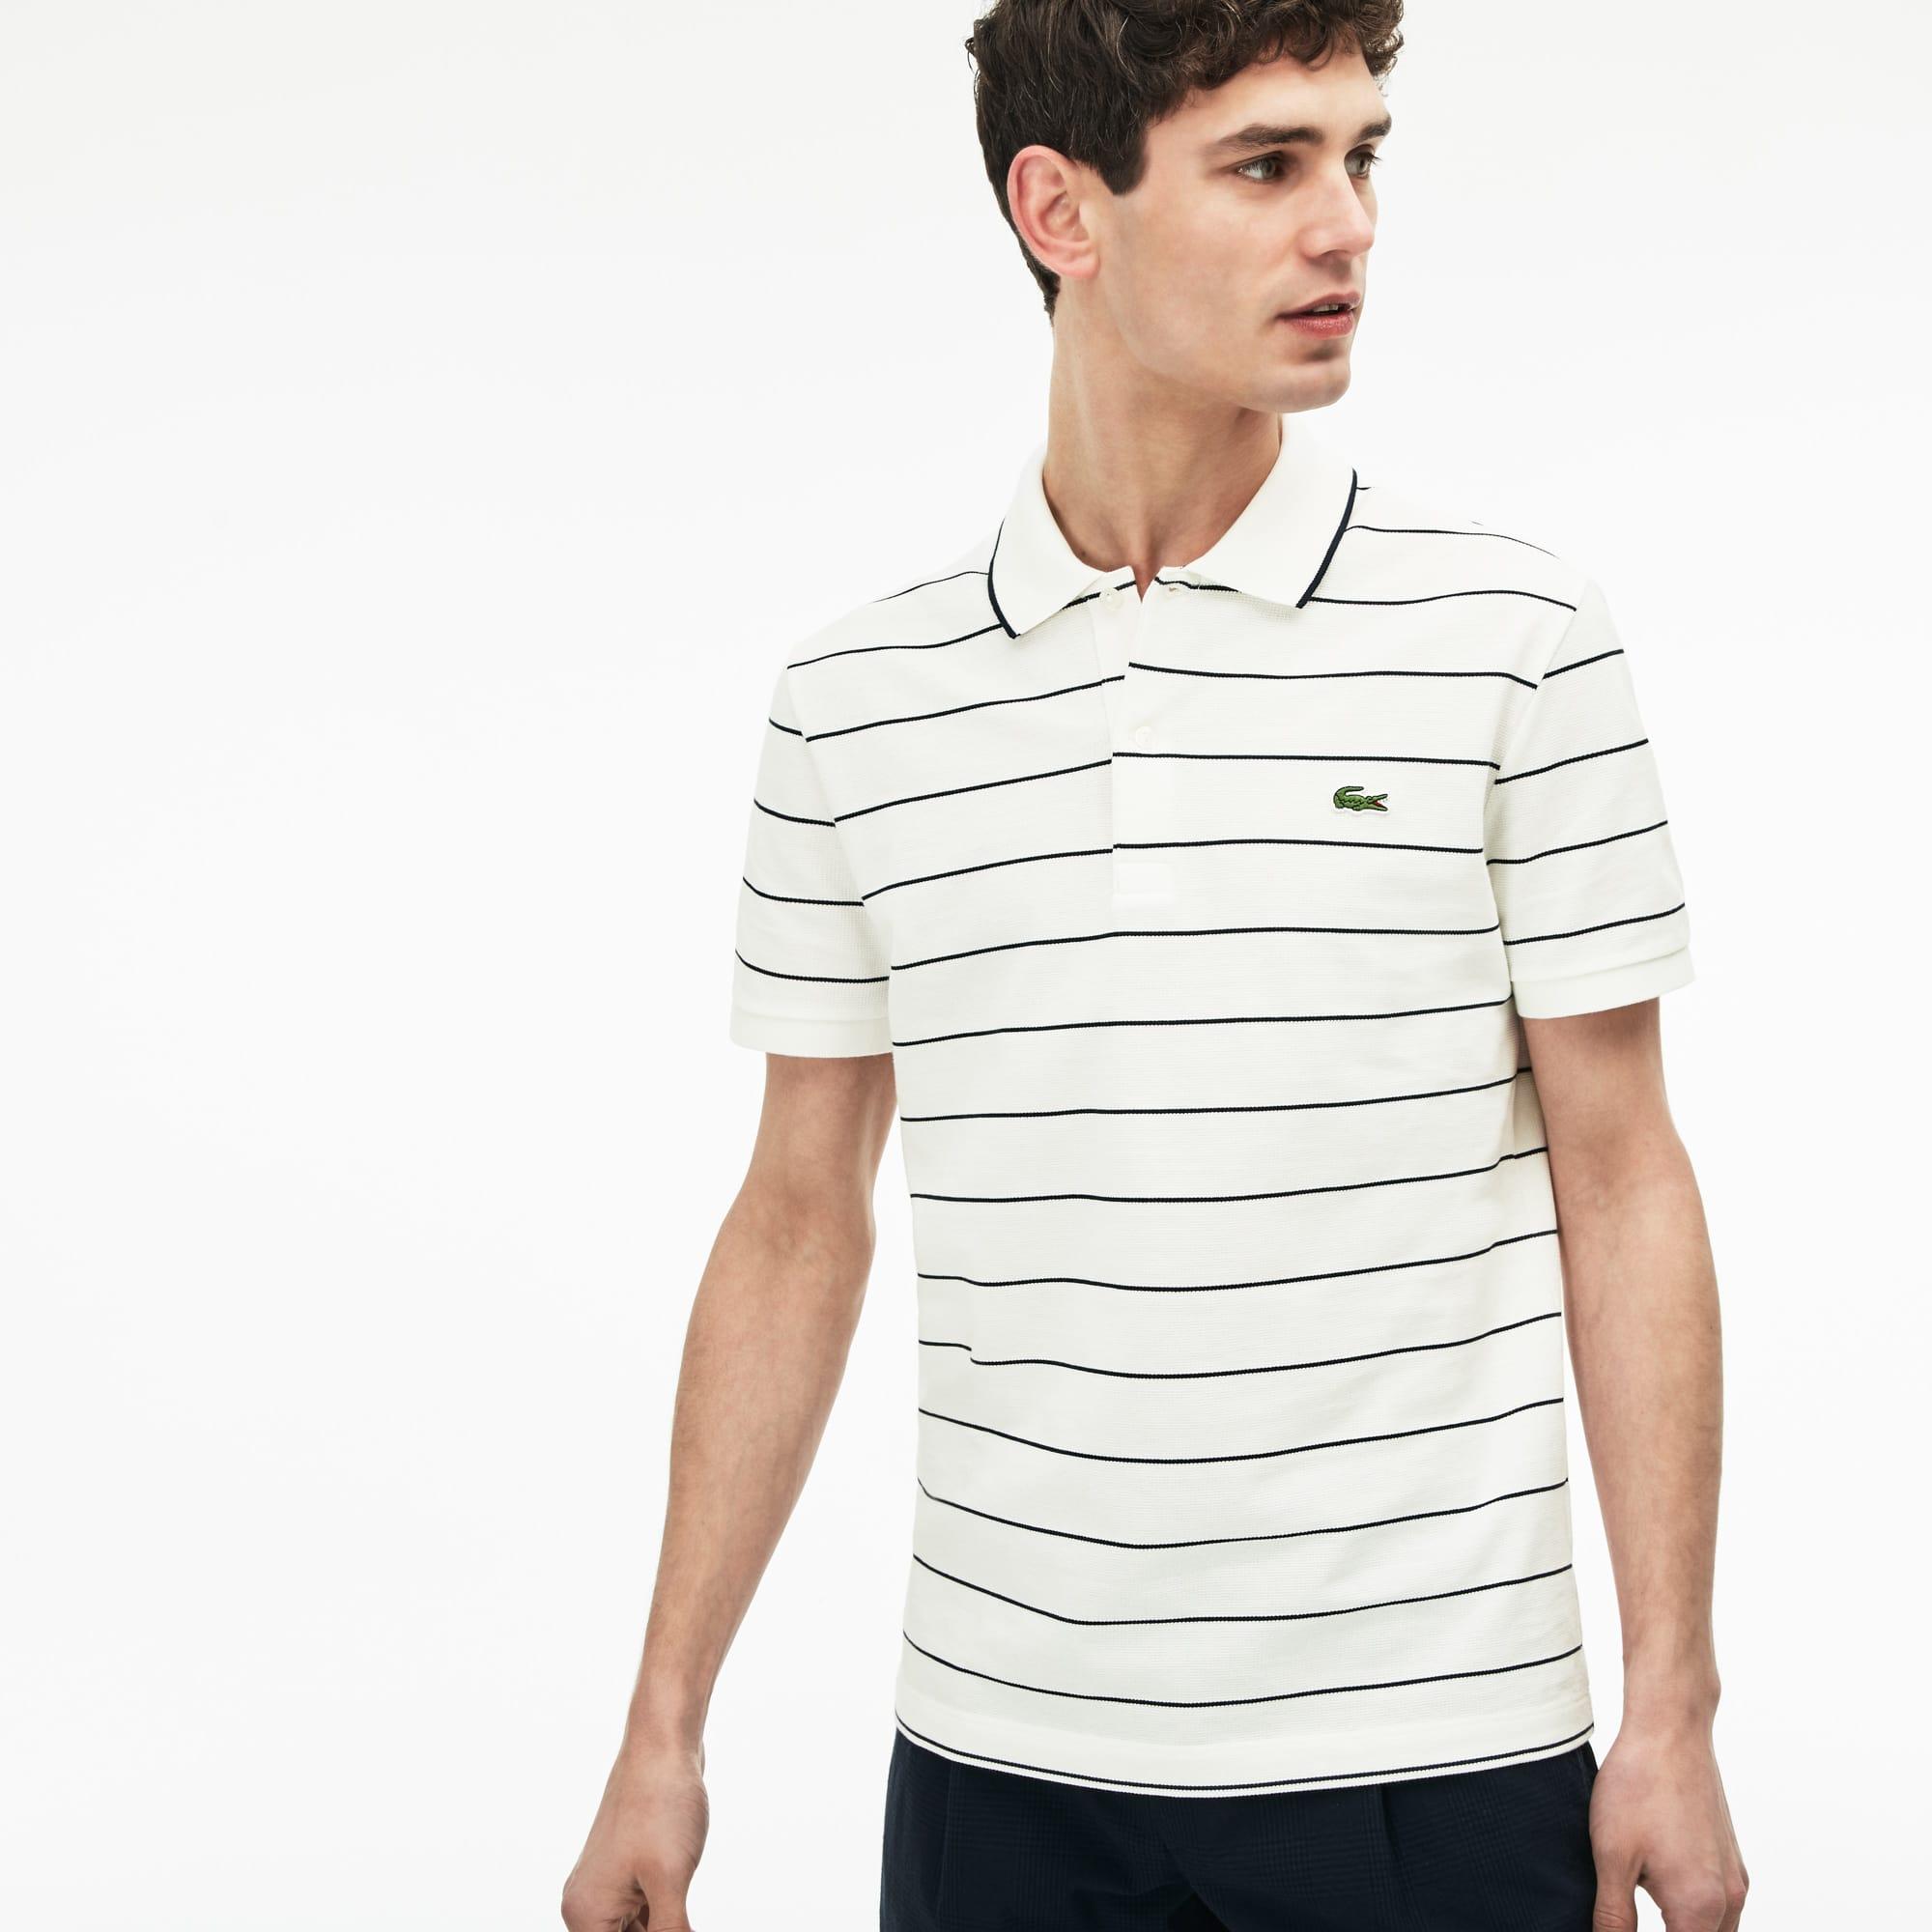 9b730c51cfc2d Camisa Polo Lacoste Slim Fit Masculina Listrada e Debruada em Jérsei e ...